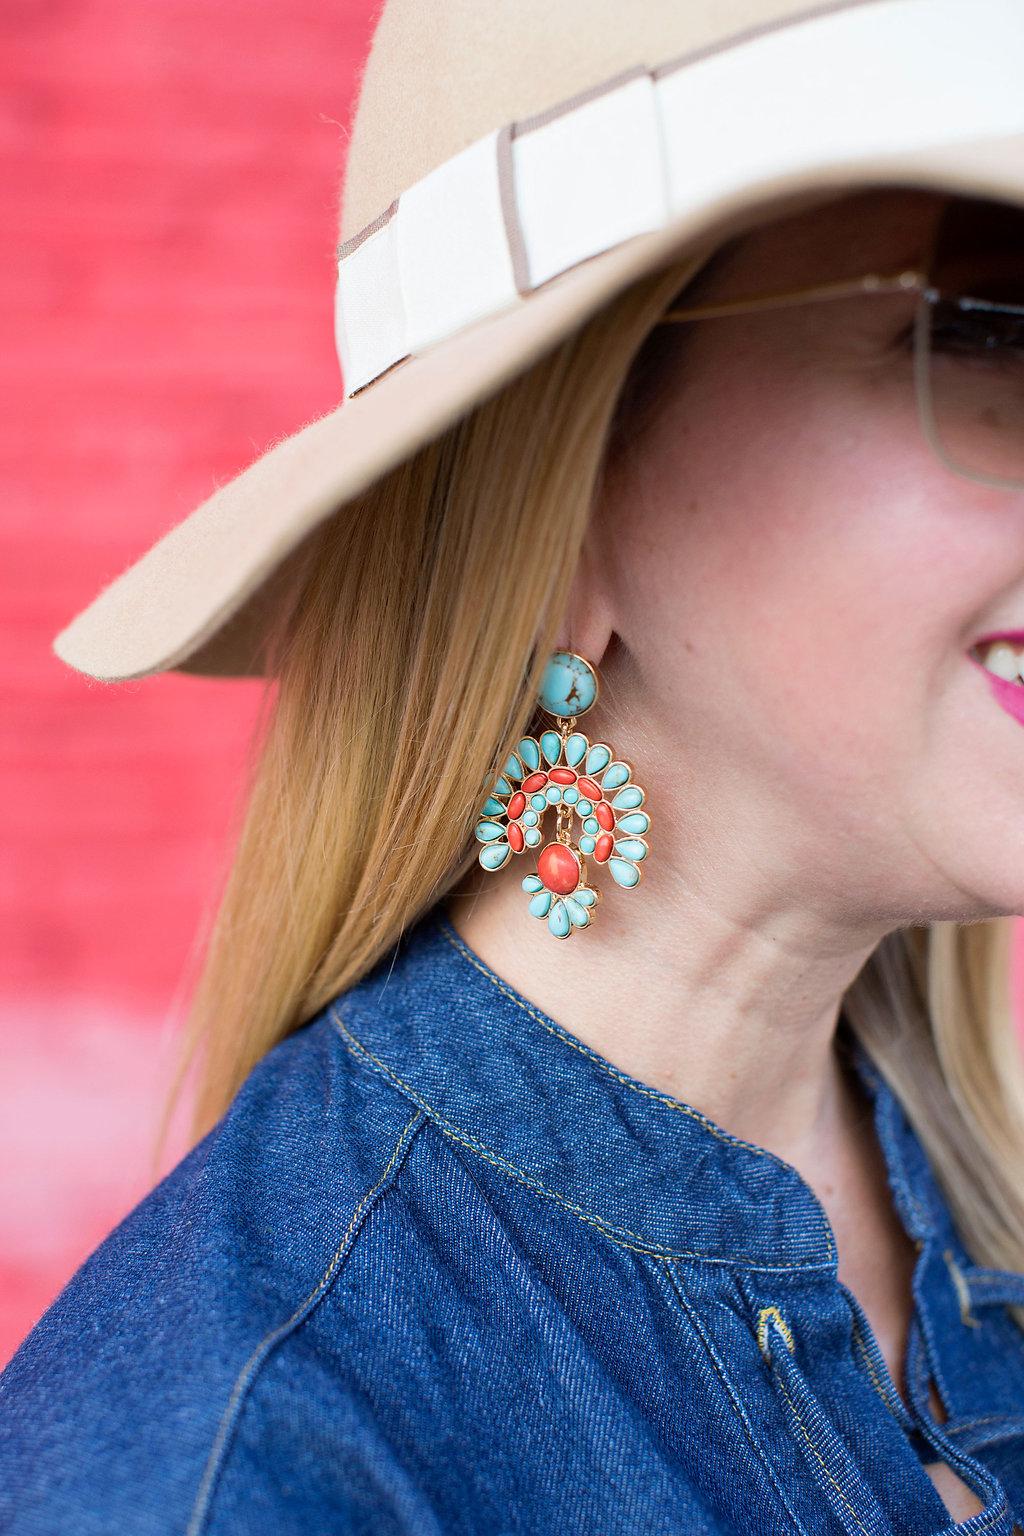 Dallas Fashion, Lifestyle Blog